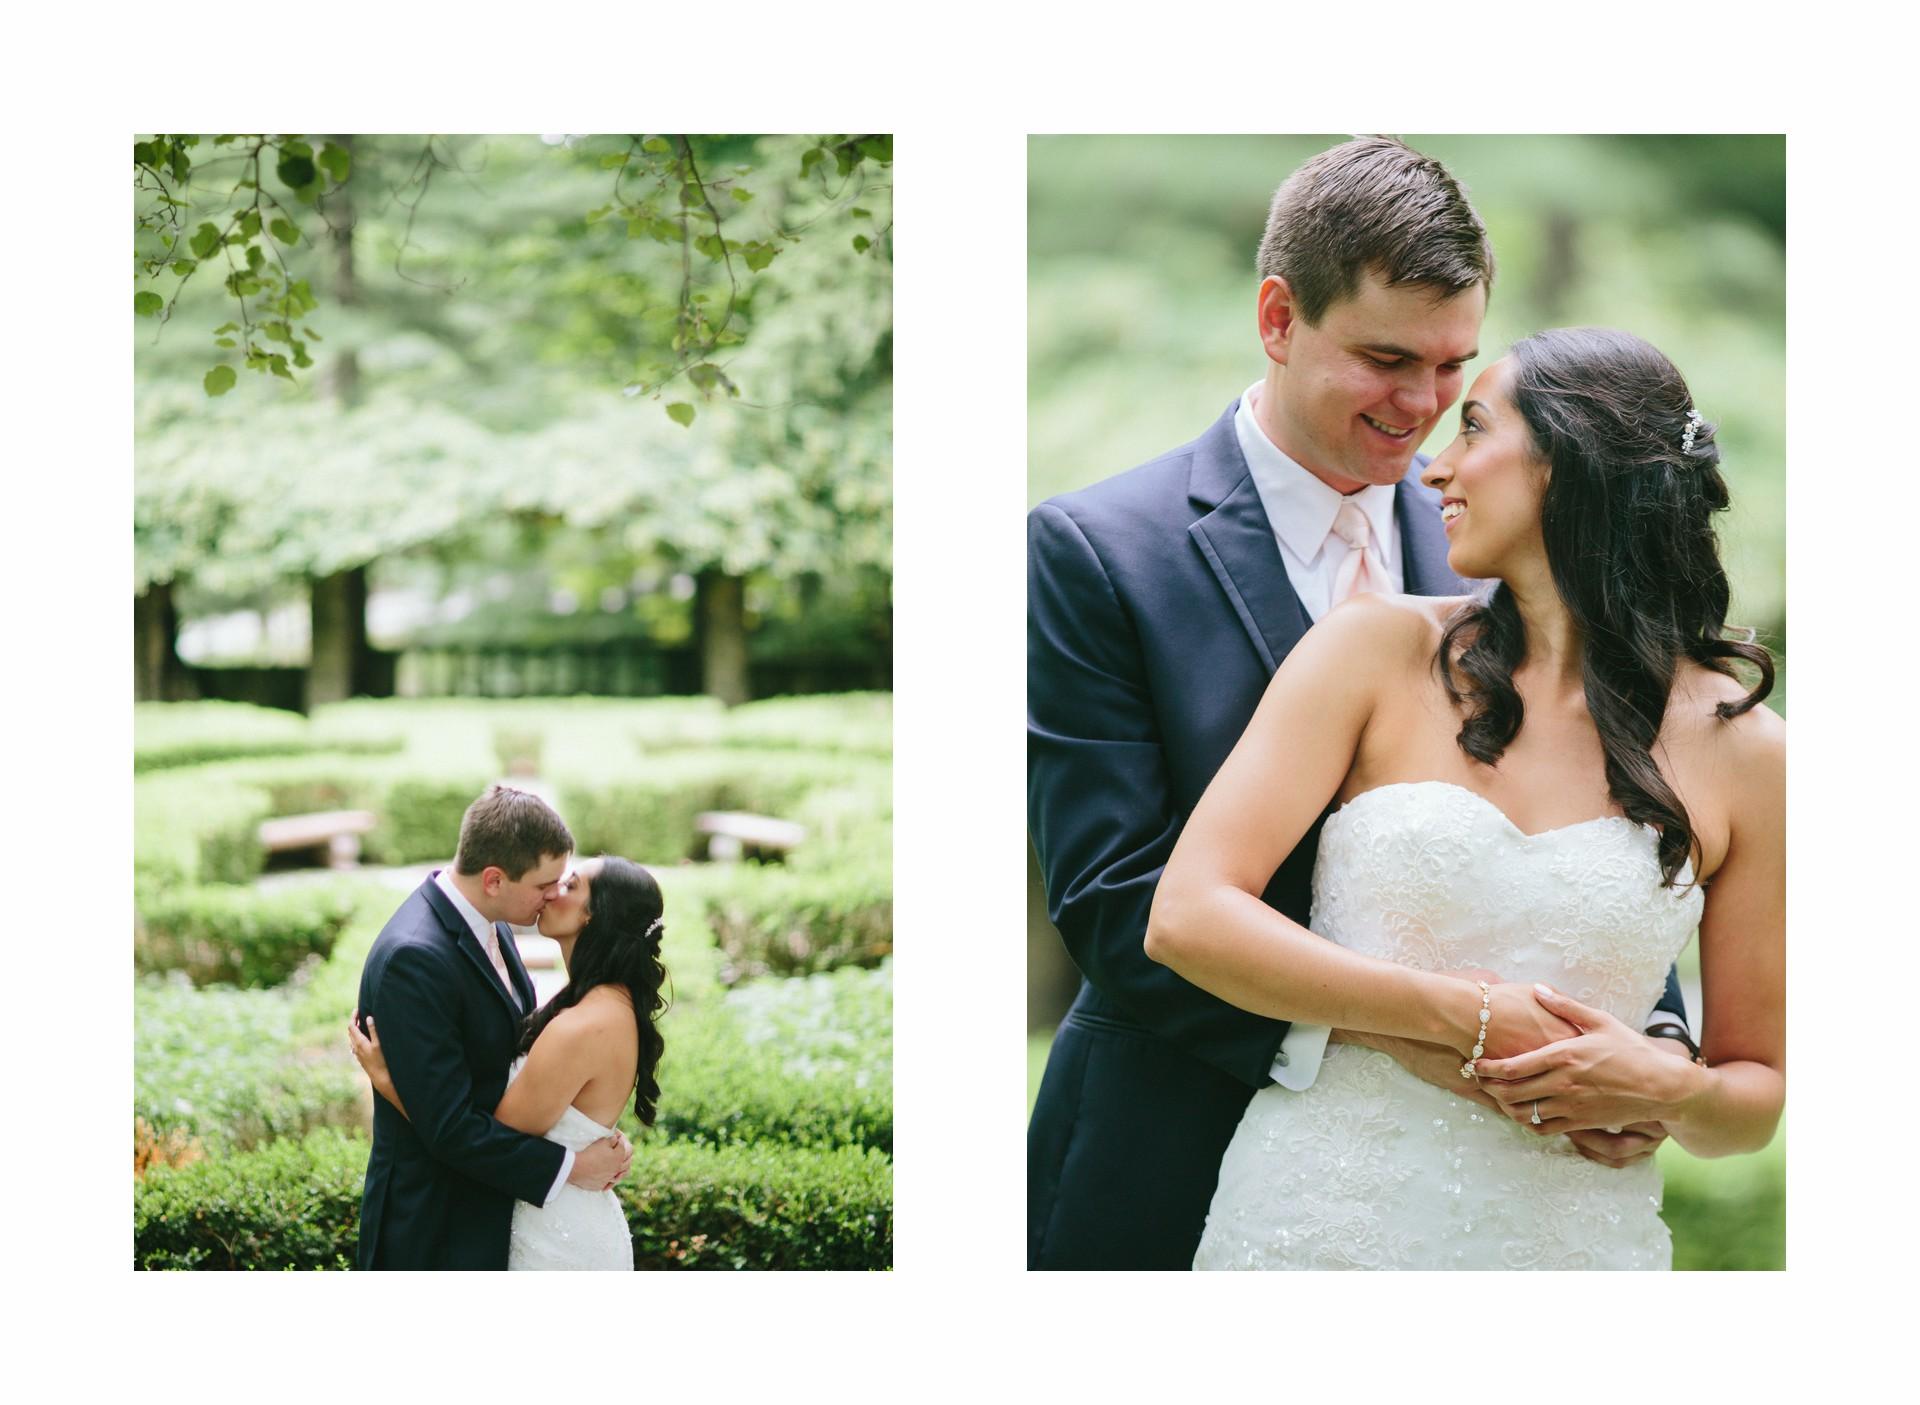 Bolton House Wedding Photographer in Beachwood 31.jpg